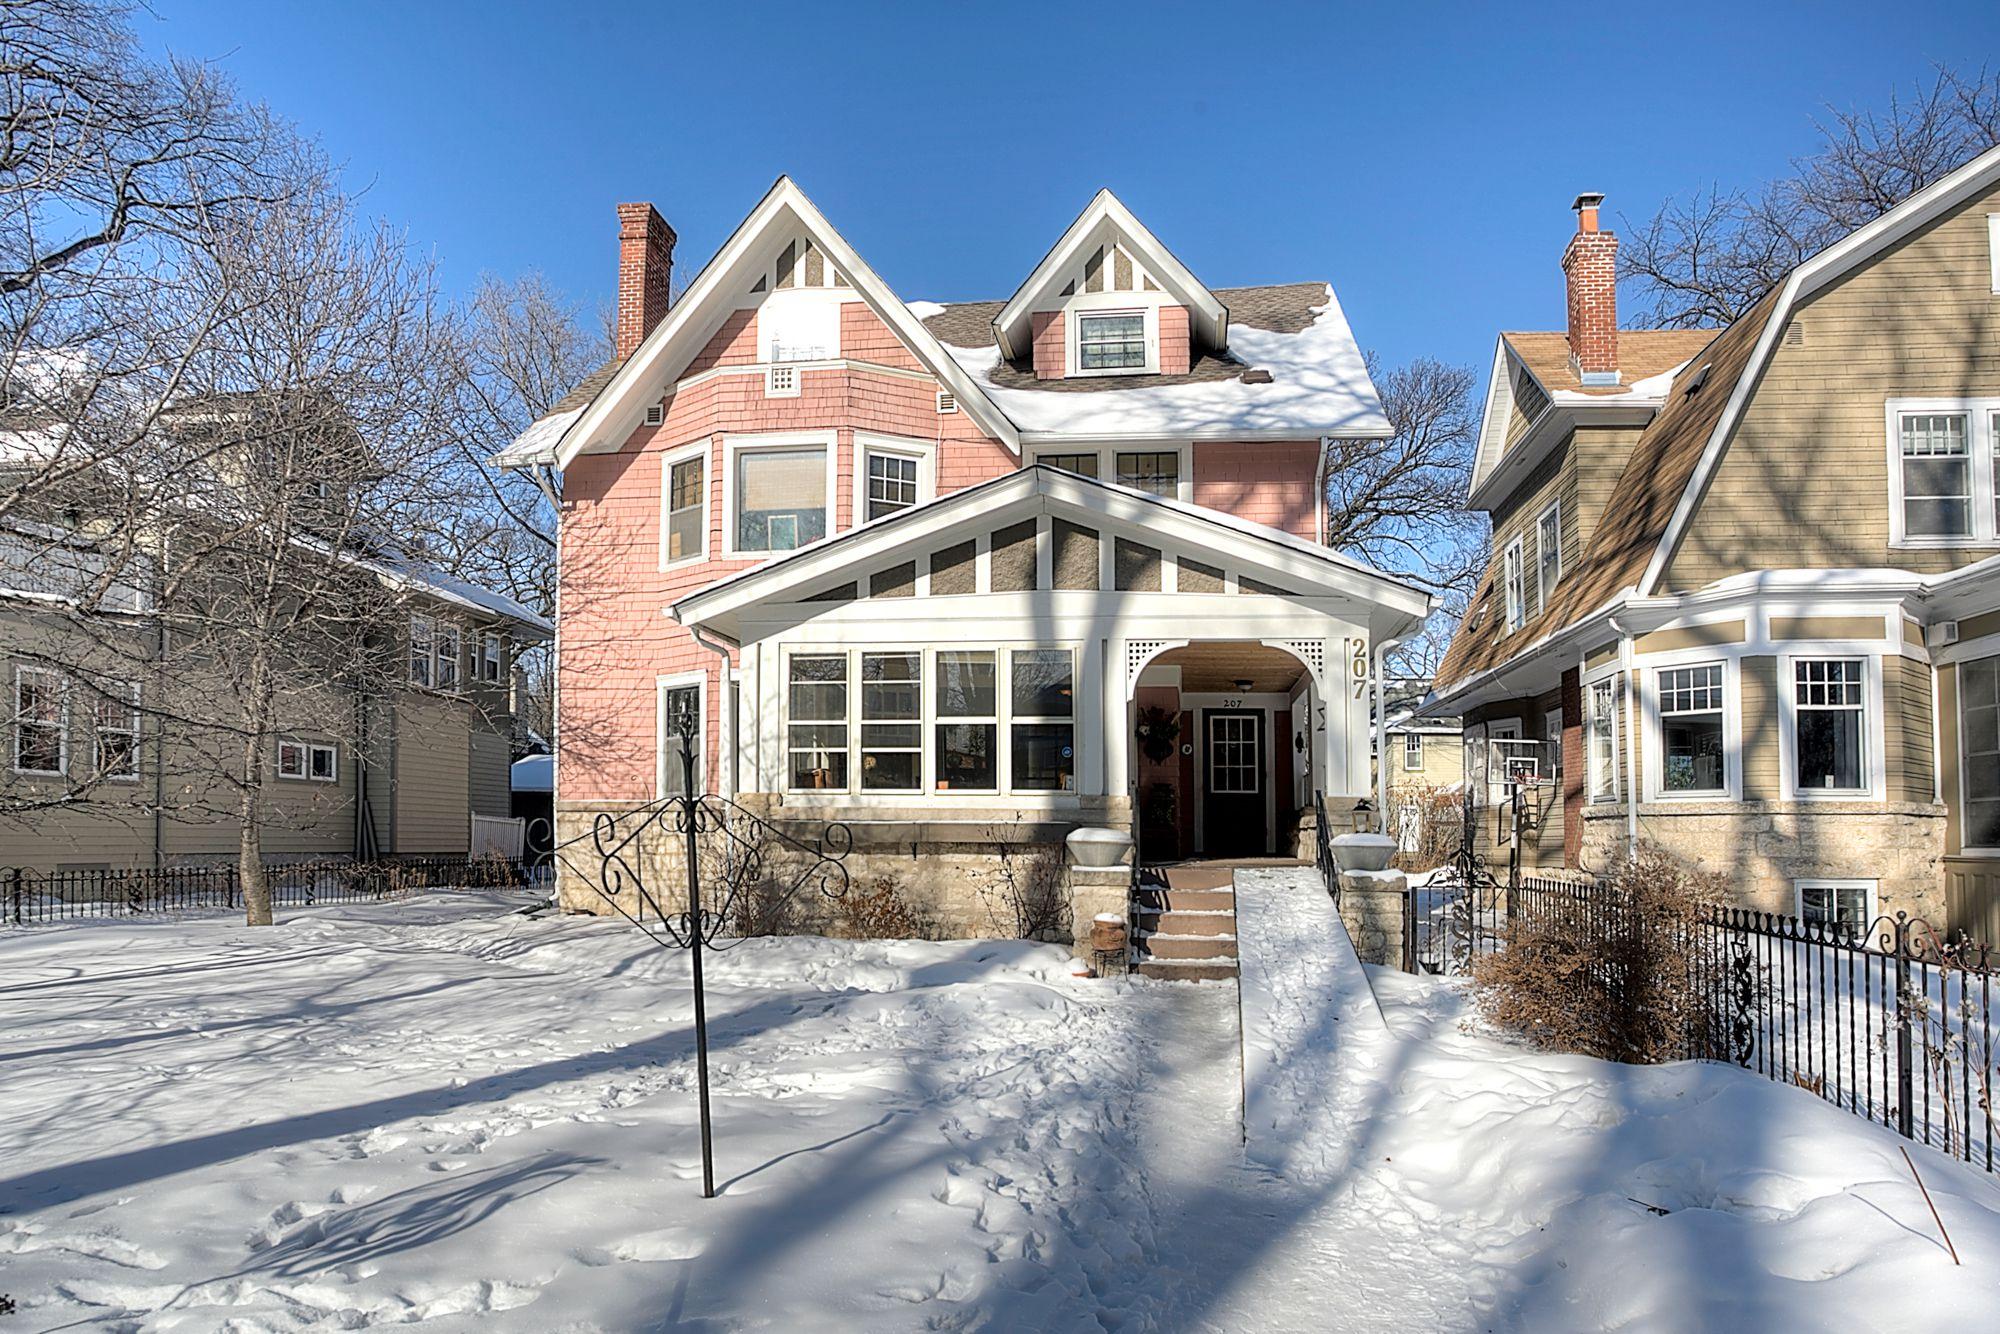 Main Photo: : Duplex for sale : MLS®# 1802539